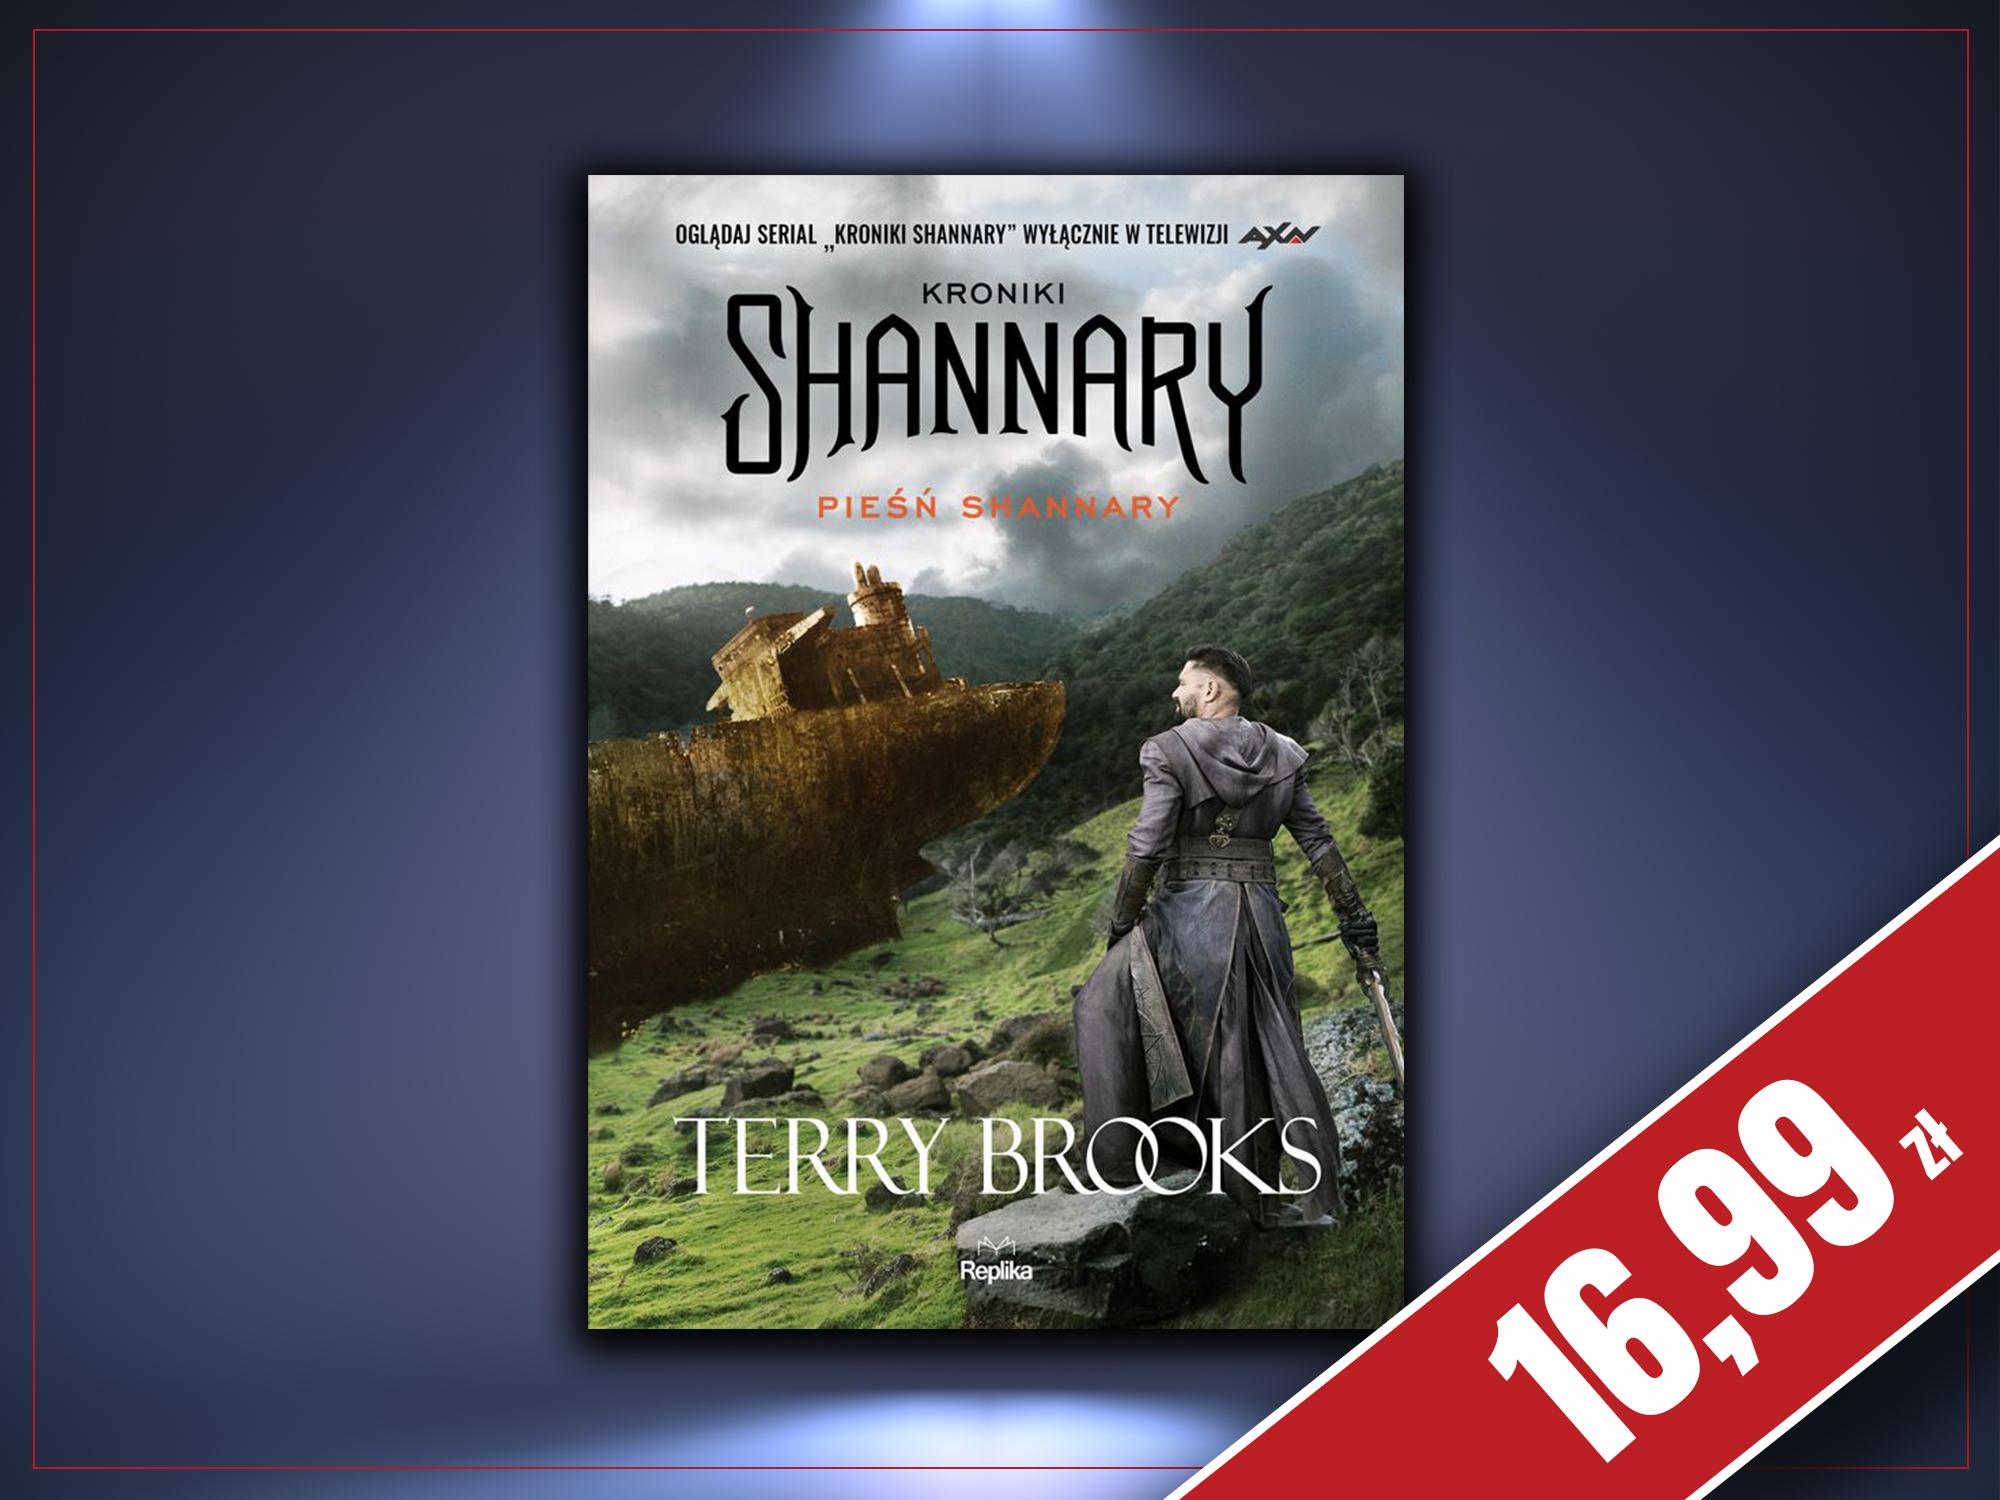 Kroniki Shannary. Pieśń Shannary, Terry Brooks